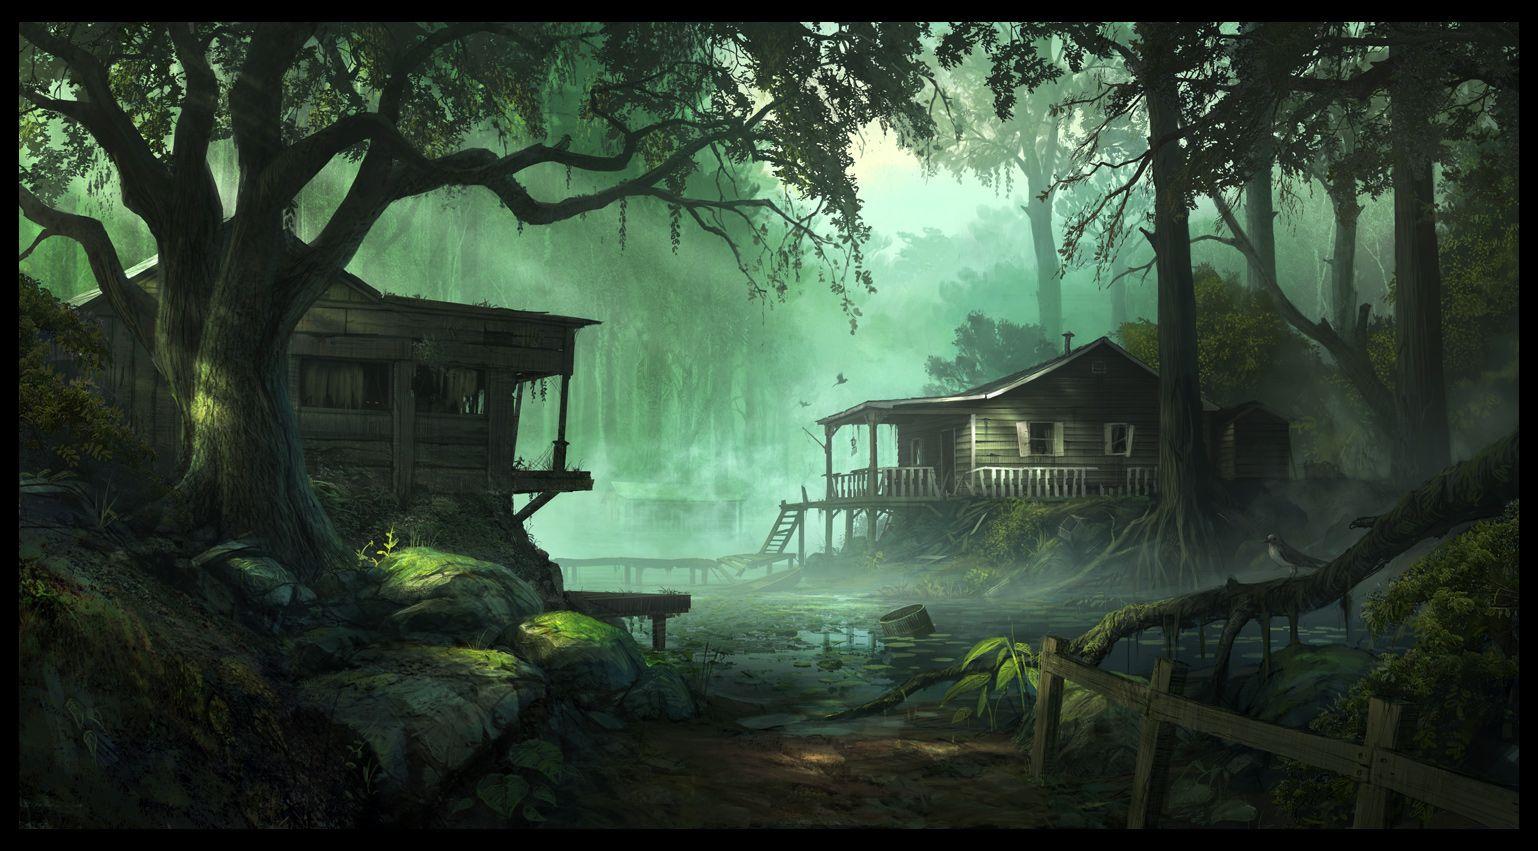 The Ruins In The Forest森の中の廃墟の壁紙 Digitale Malerei